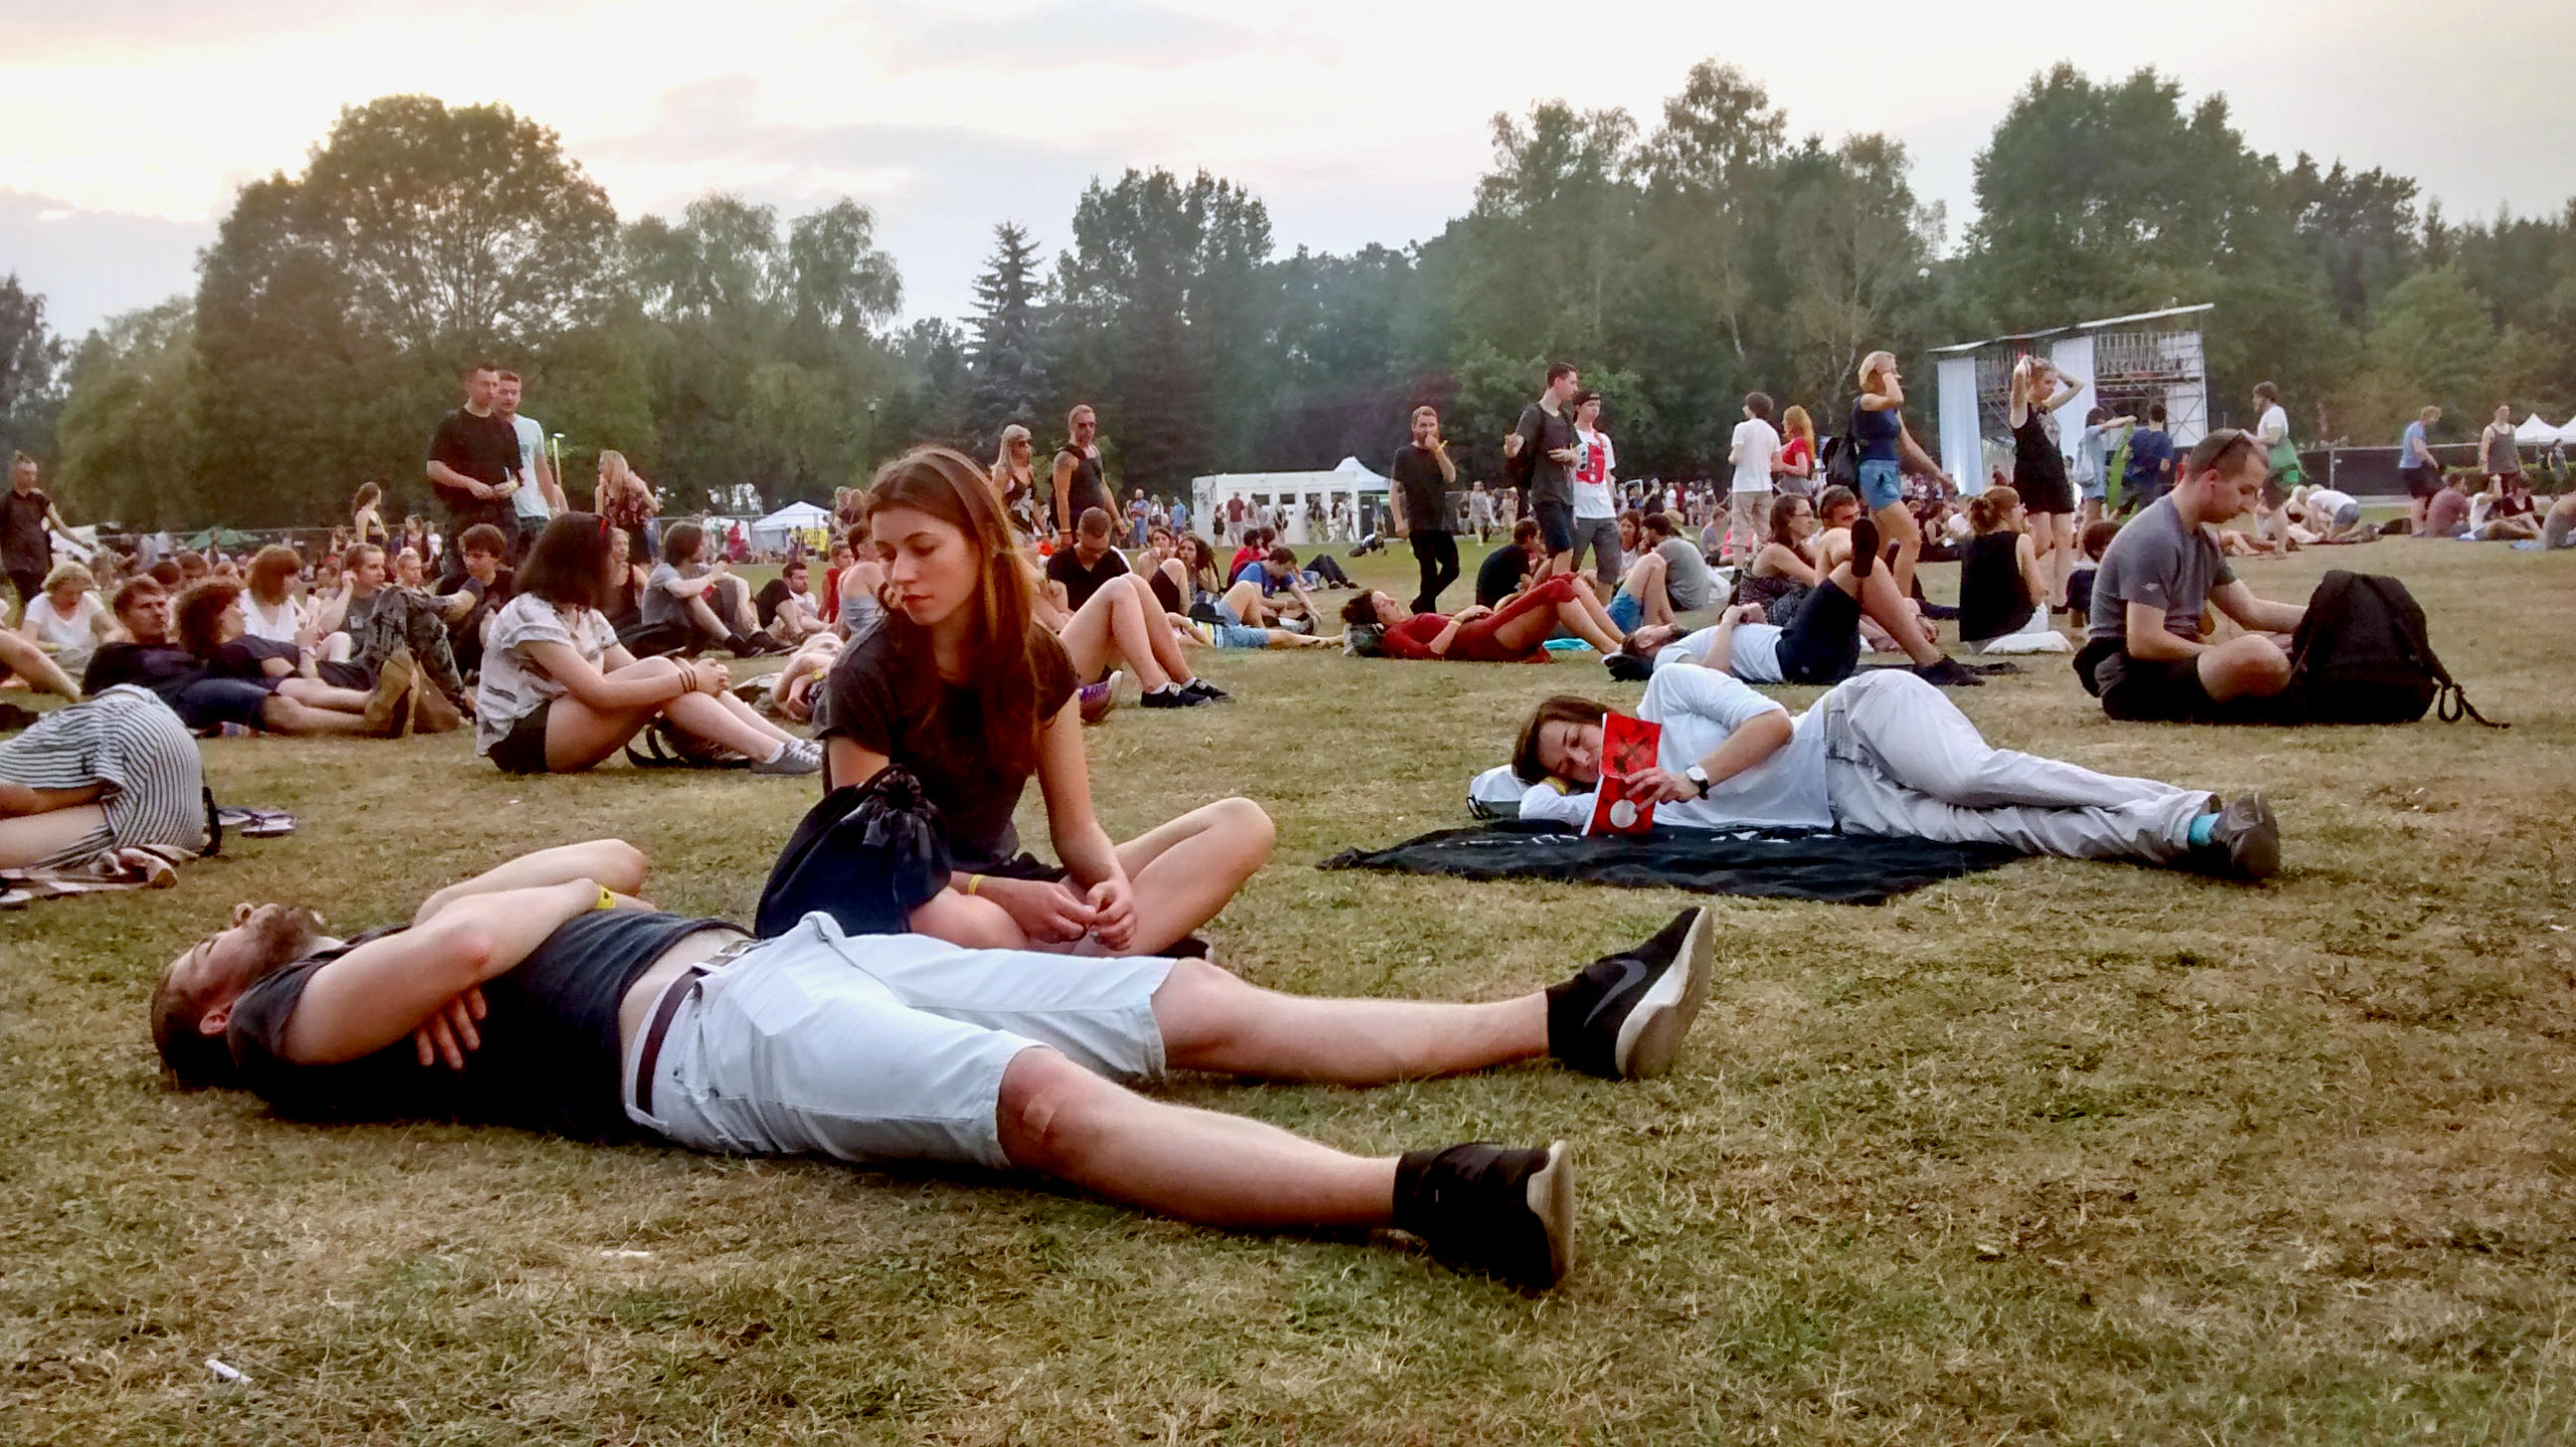 Off Festival, fot. Sara Marondel